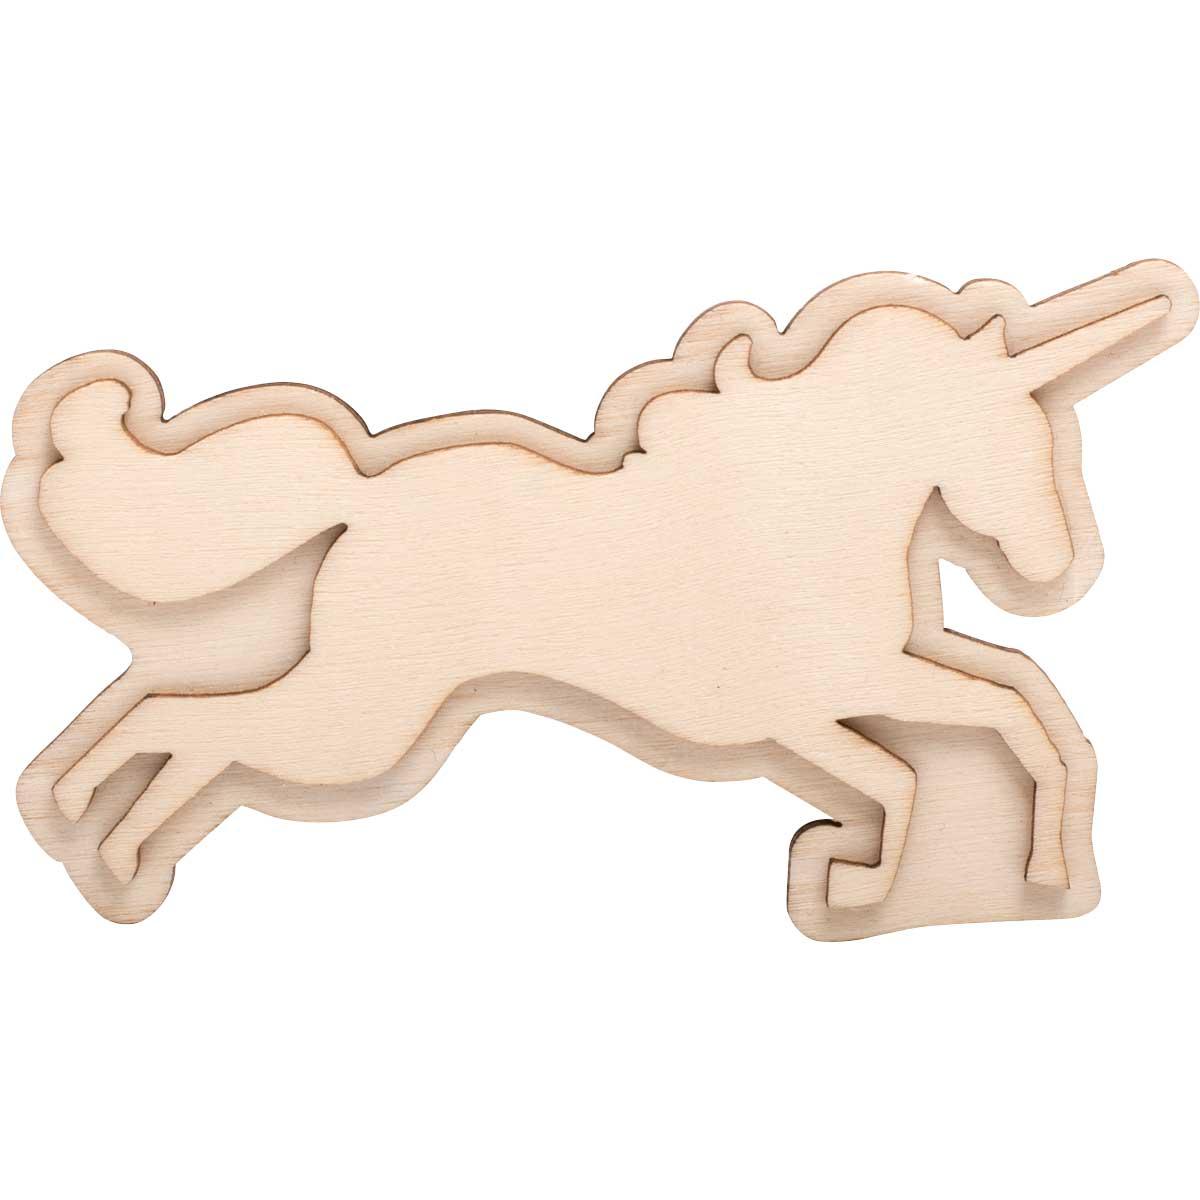 Plaid ® Wood Surfaces - Unpainted Layered Shapes - Unicorn